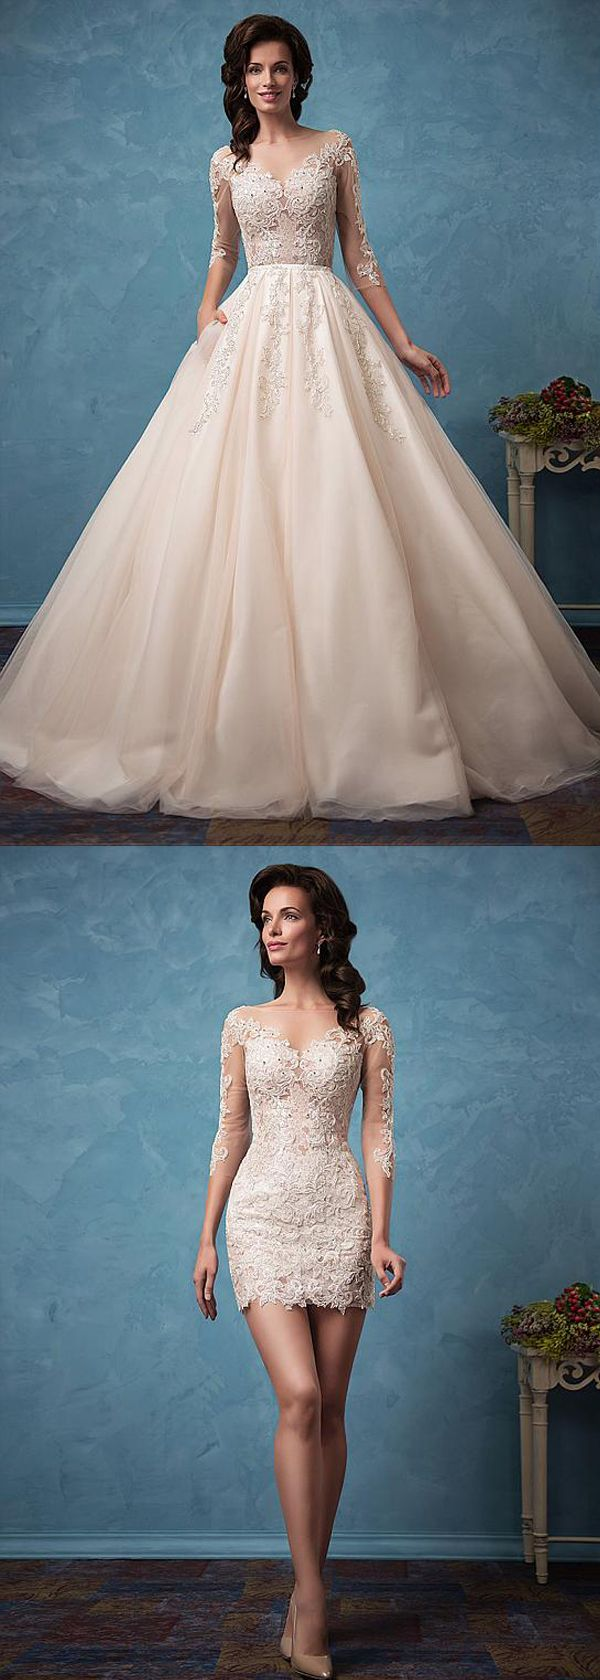 3230 best Beautiful Wedding Dresses & Themes images on Pinterest ...